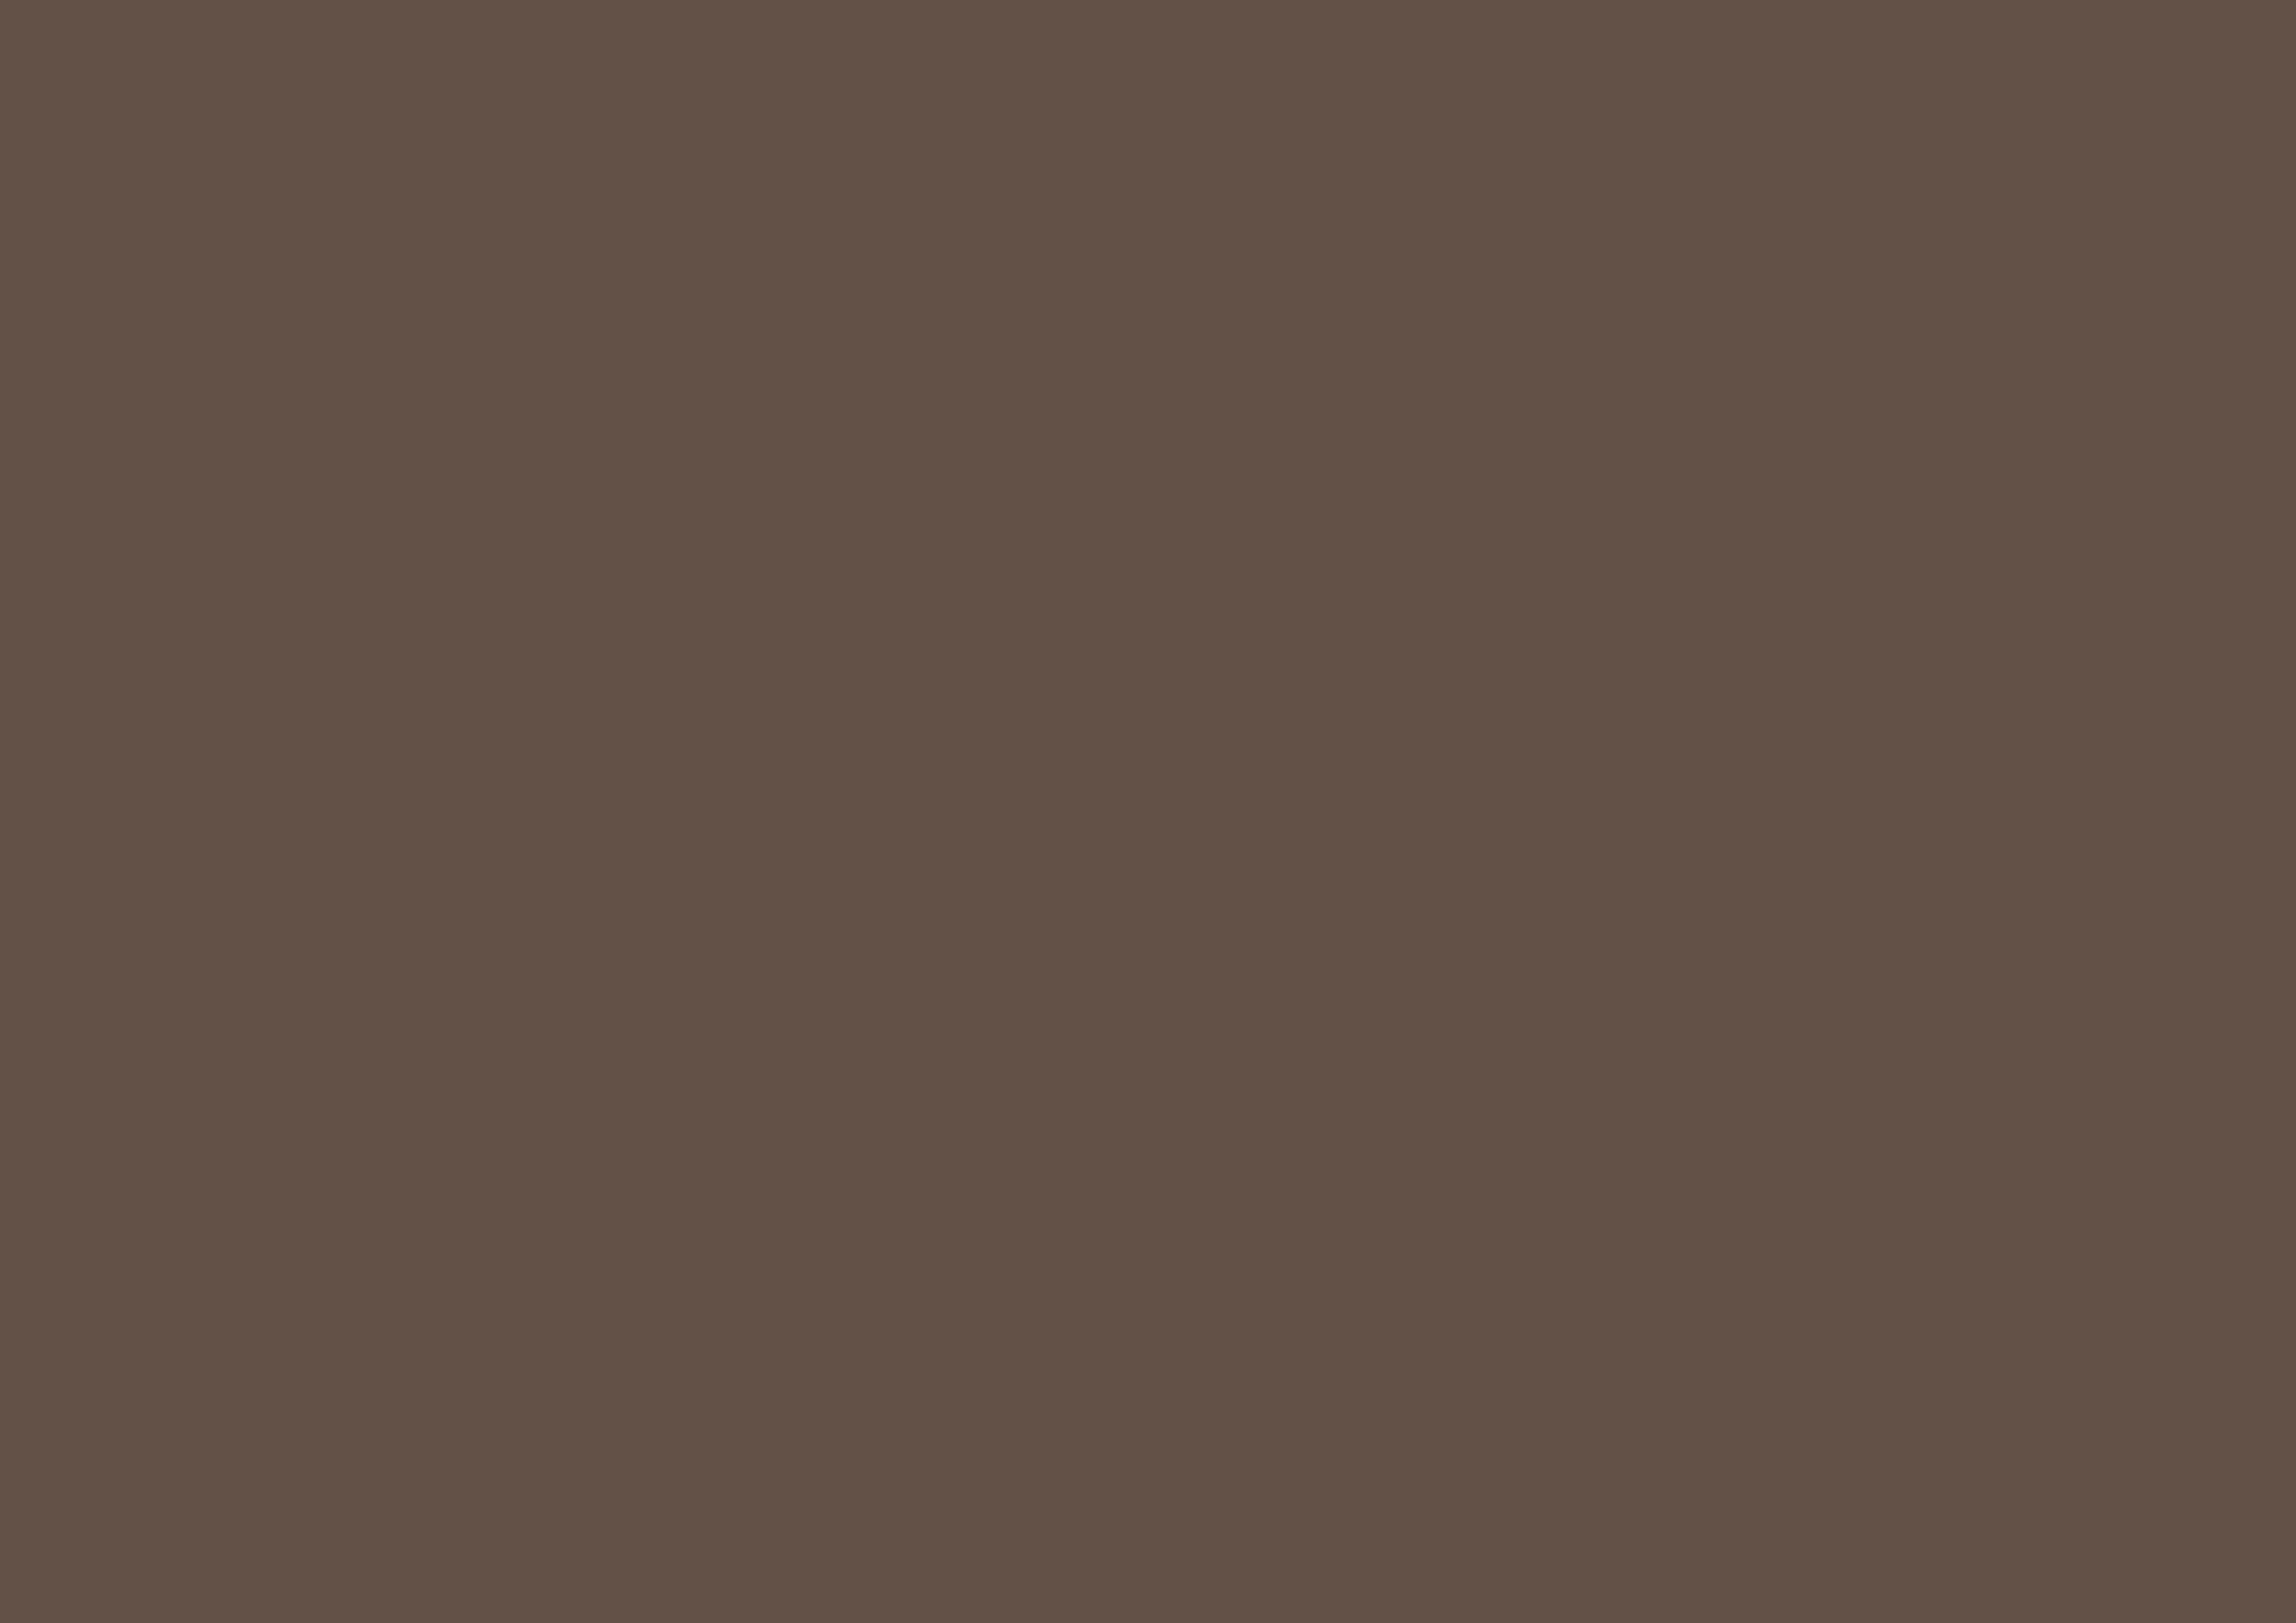 3508x2480 Umber Solid Color Background